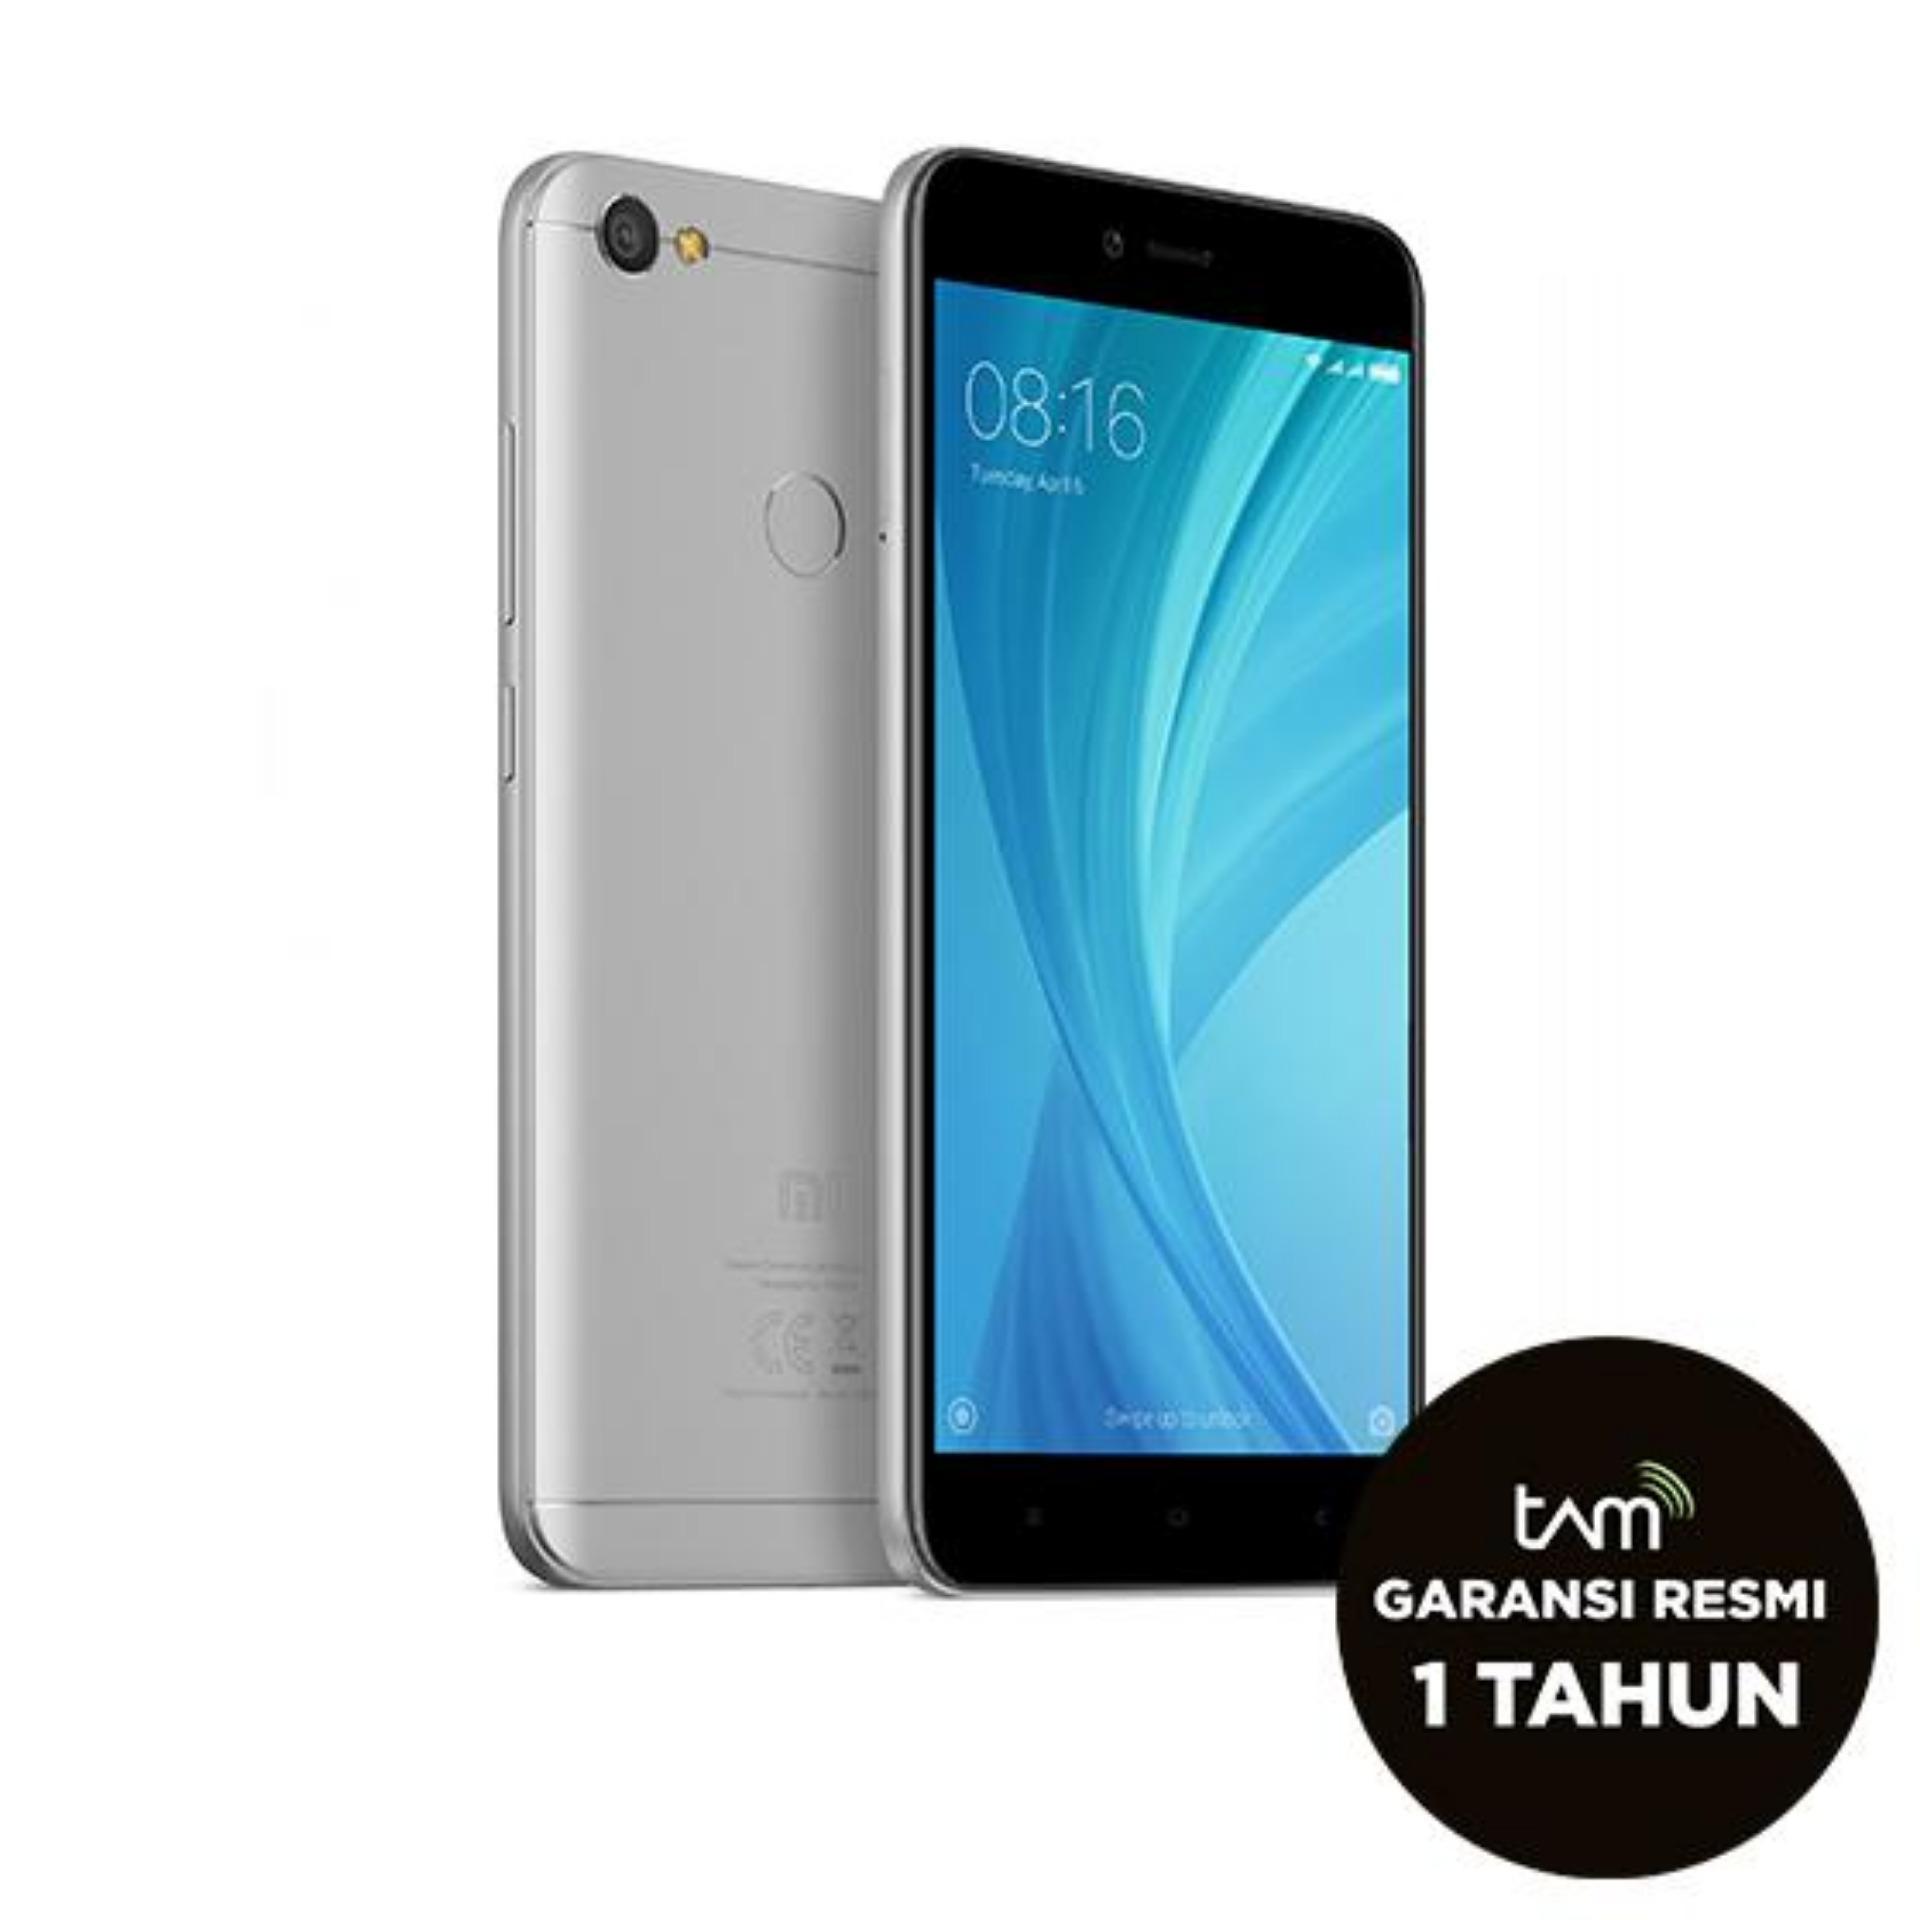 2051d Info Harga Promo Berbagai Produk Alcatel Xiaomi Redmi Note 5a Prime Ram 3 32 Gb Garansi Resmi Tam